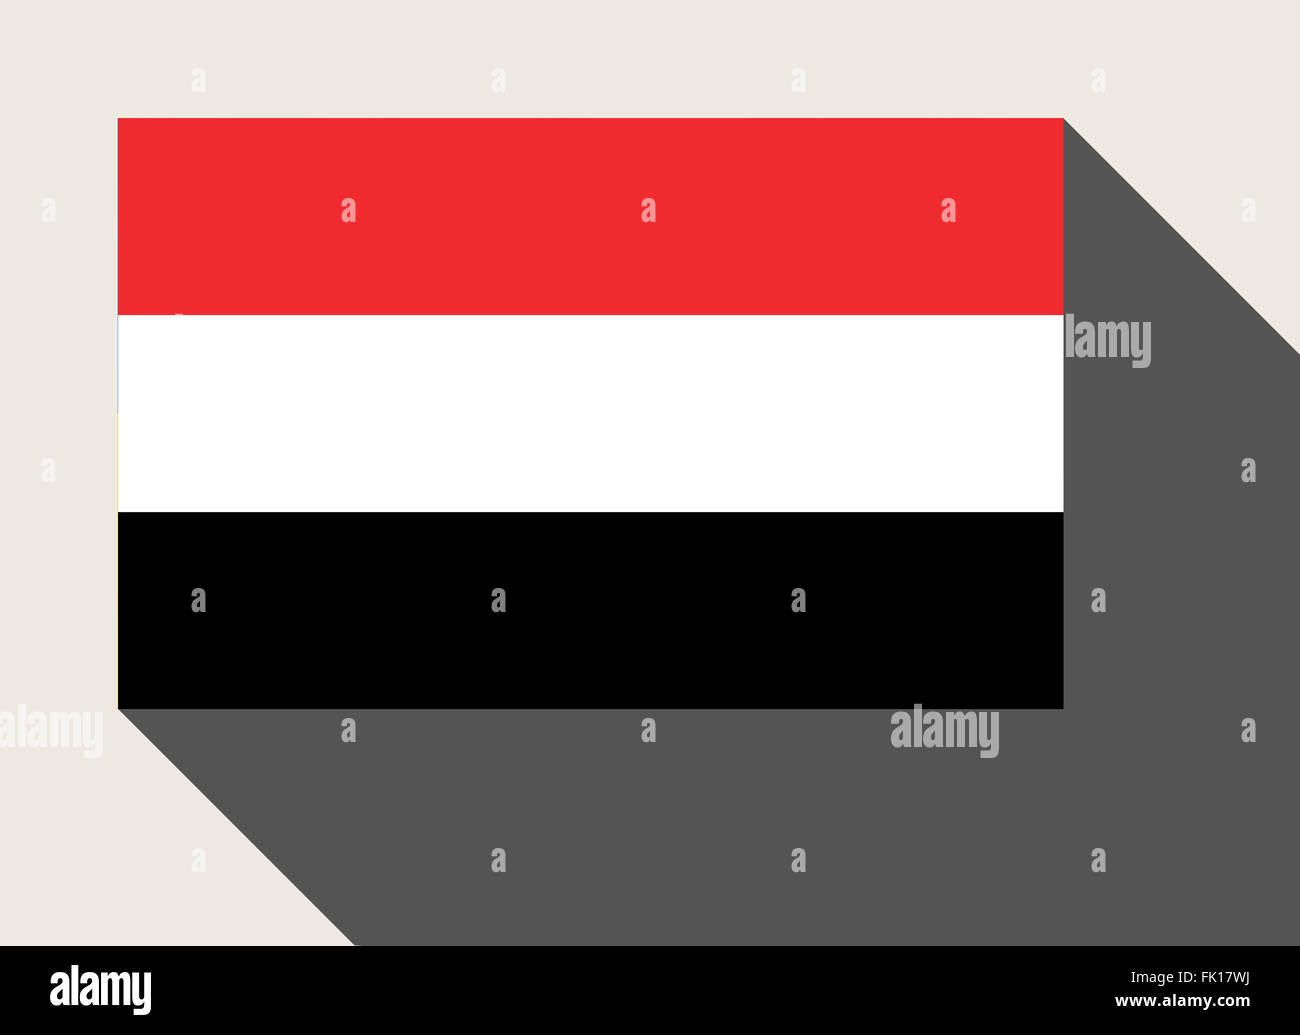 Yemen flag in flat web design style. - Stock Image